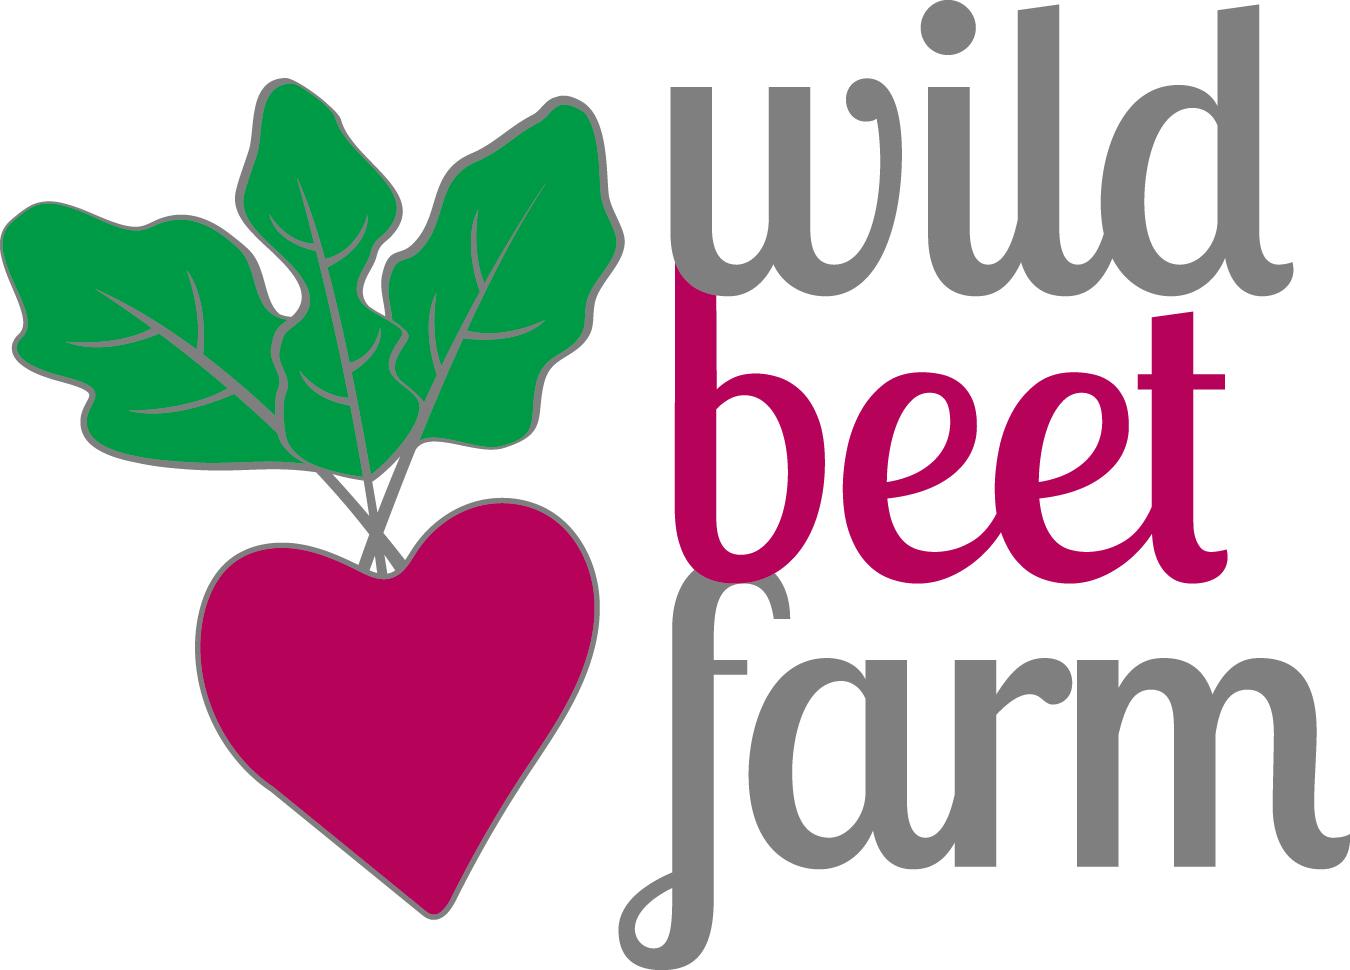 Wild_Beet_Farm.jpg